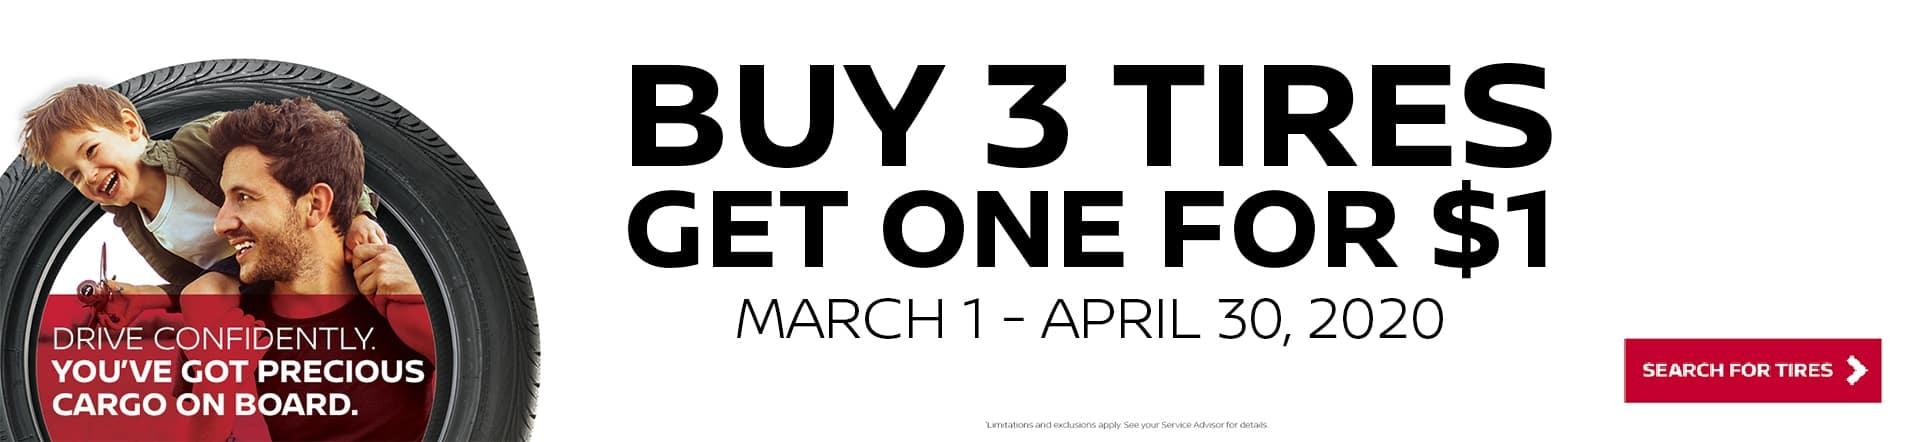 Nissan-Buy-3-Tires-Offer